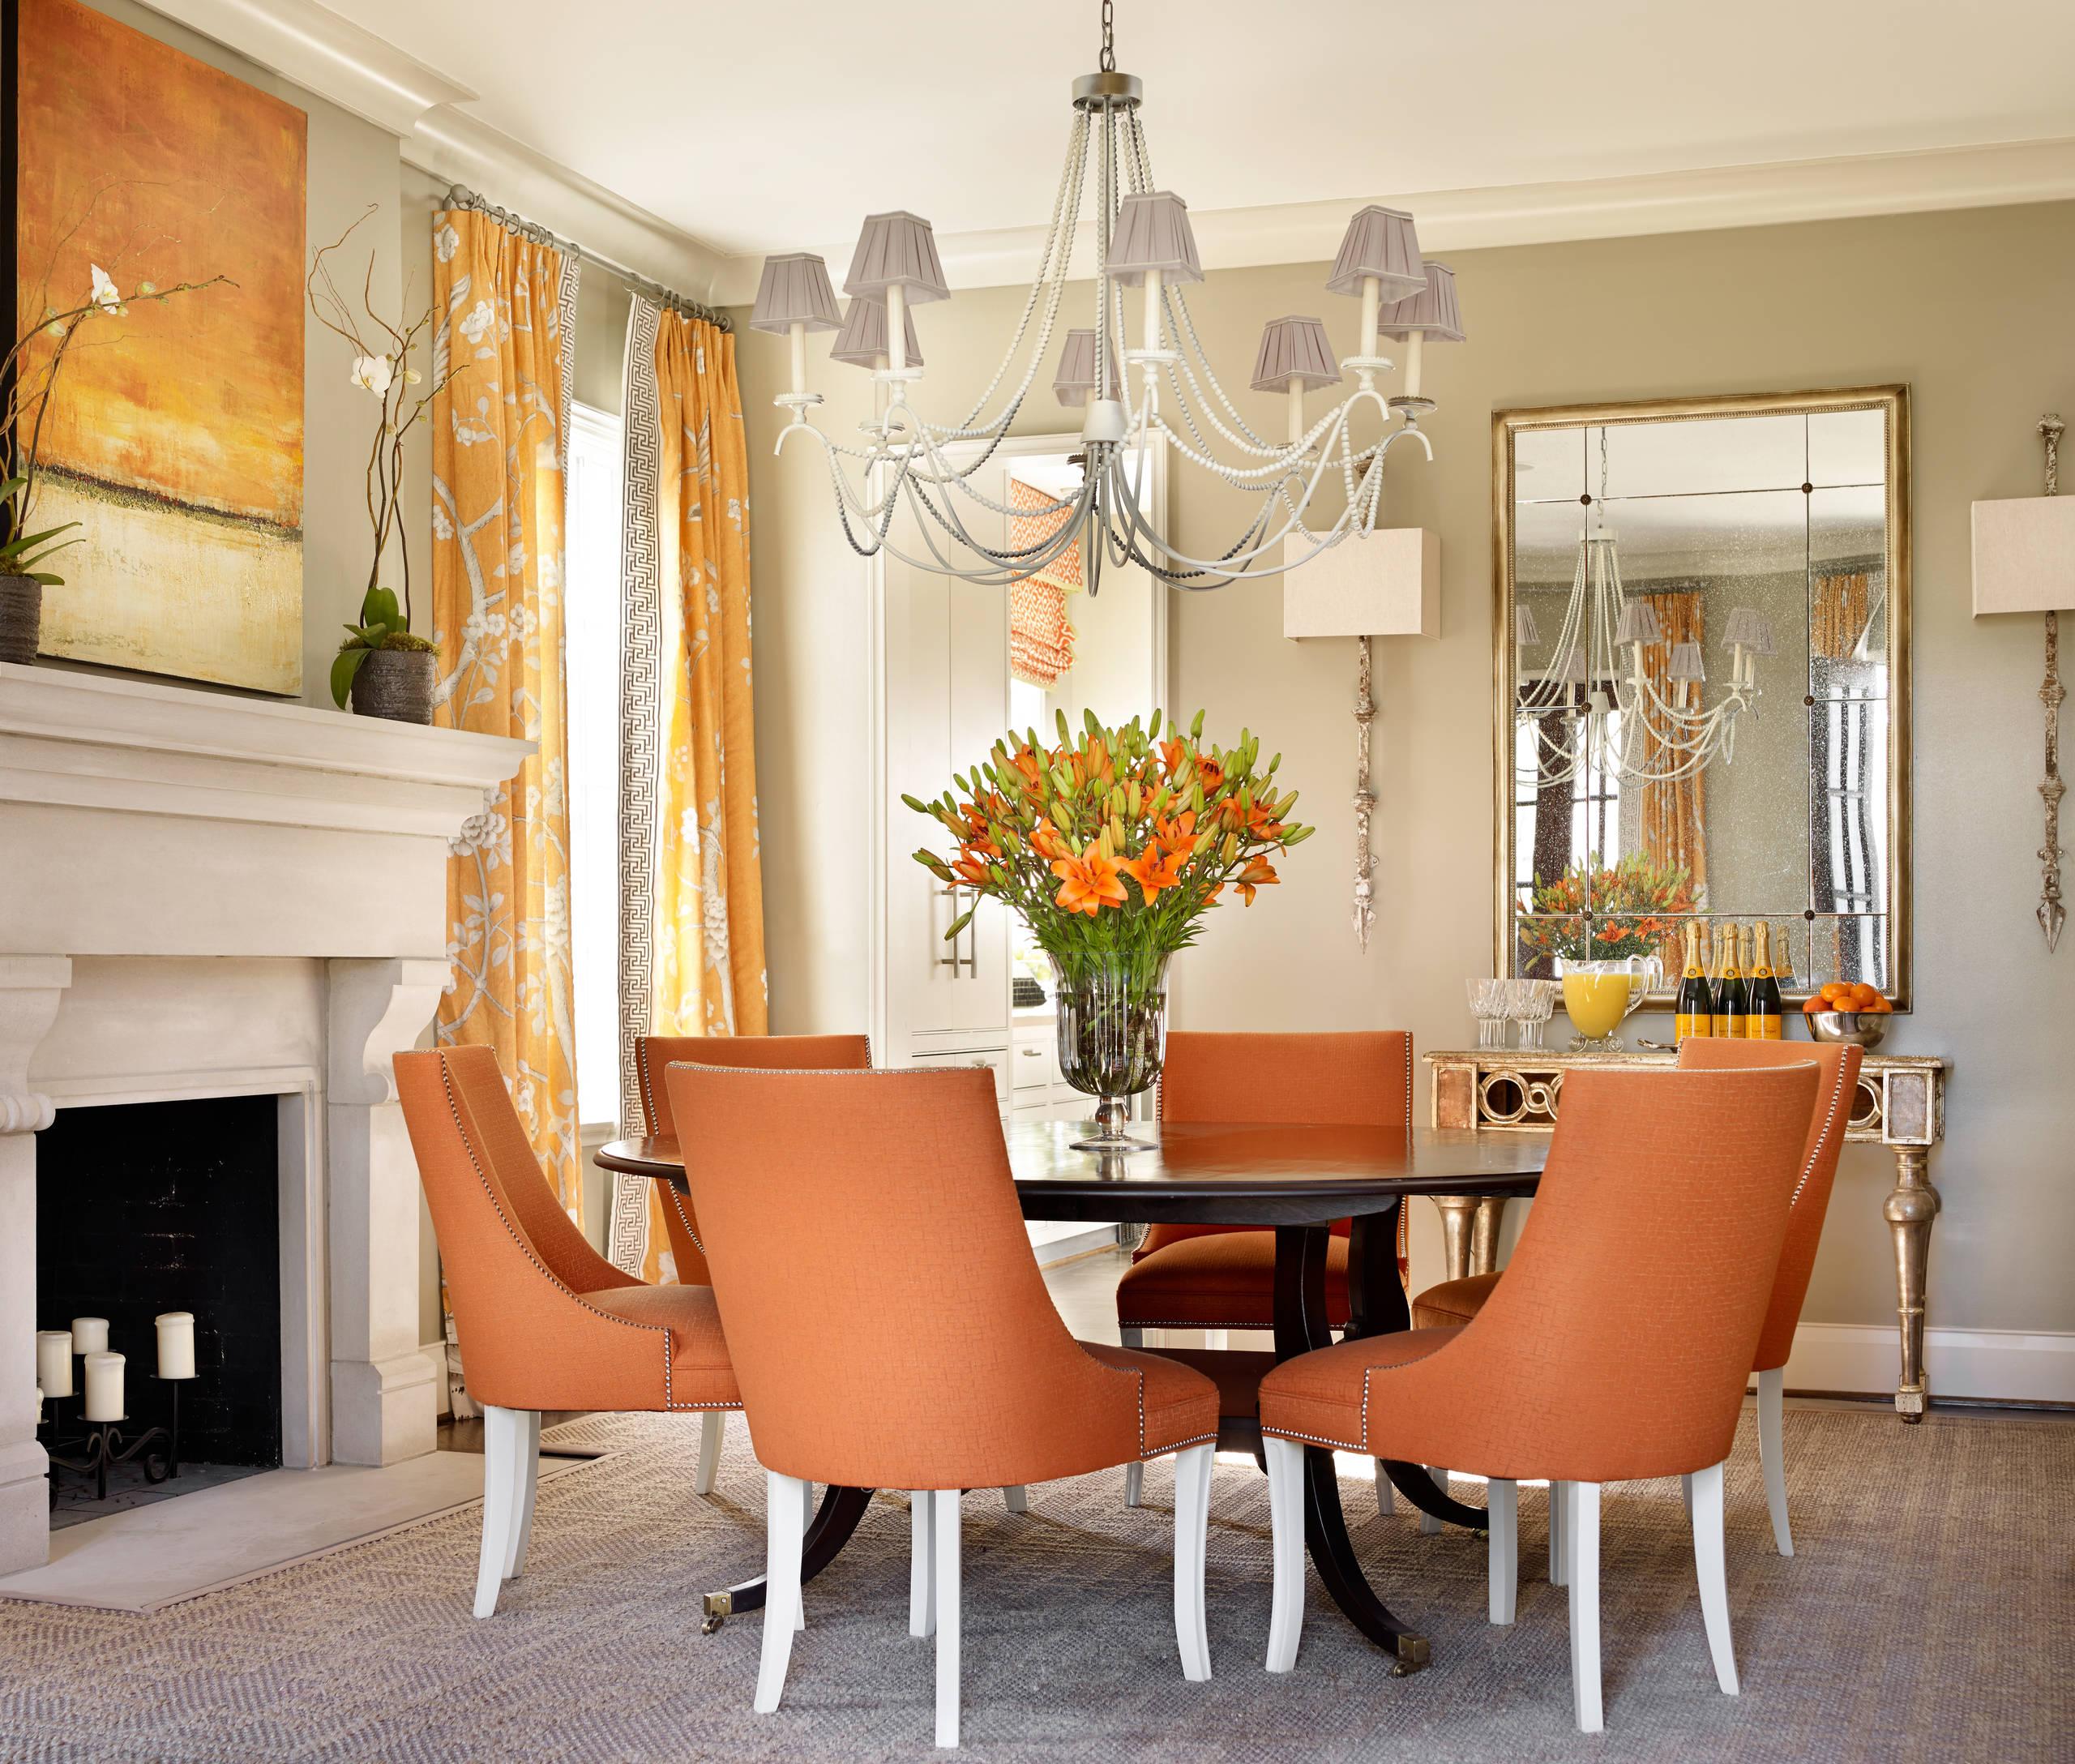 Deo dnevne sobe uređen prema paleti boja